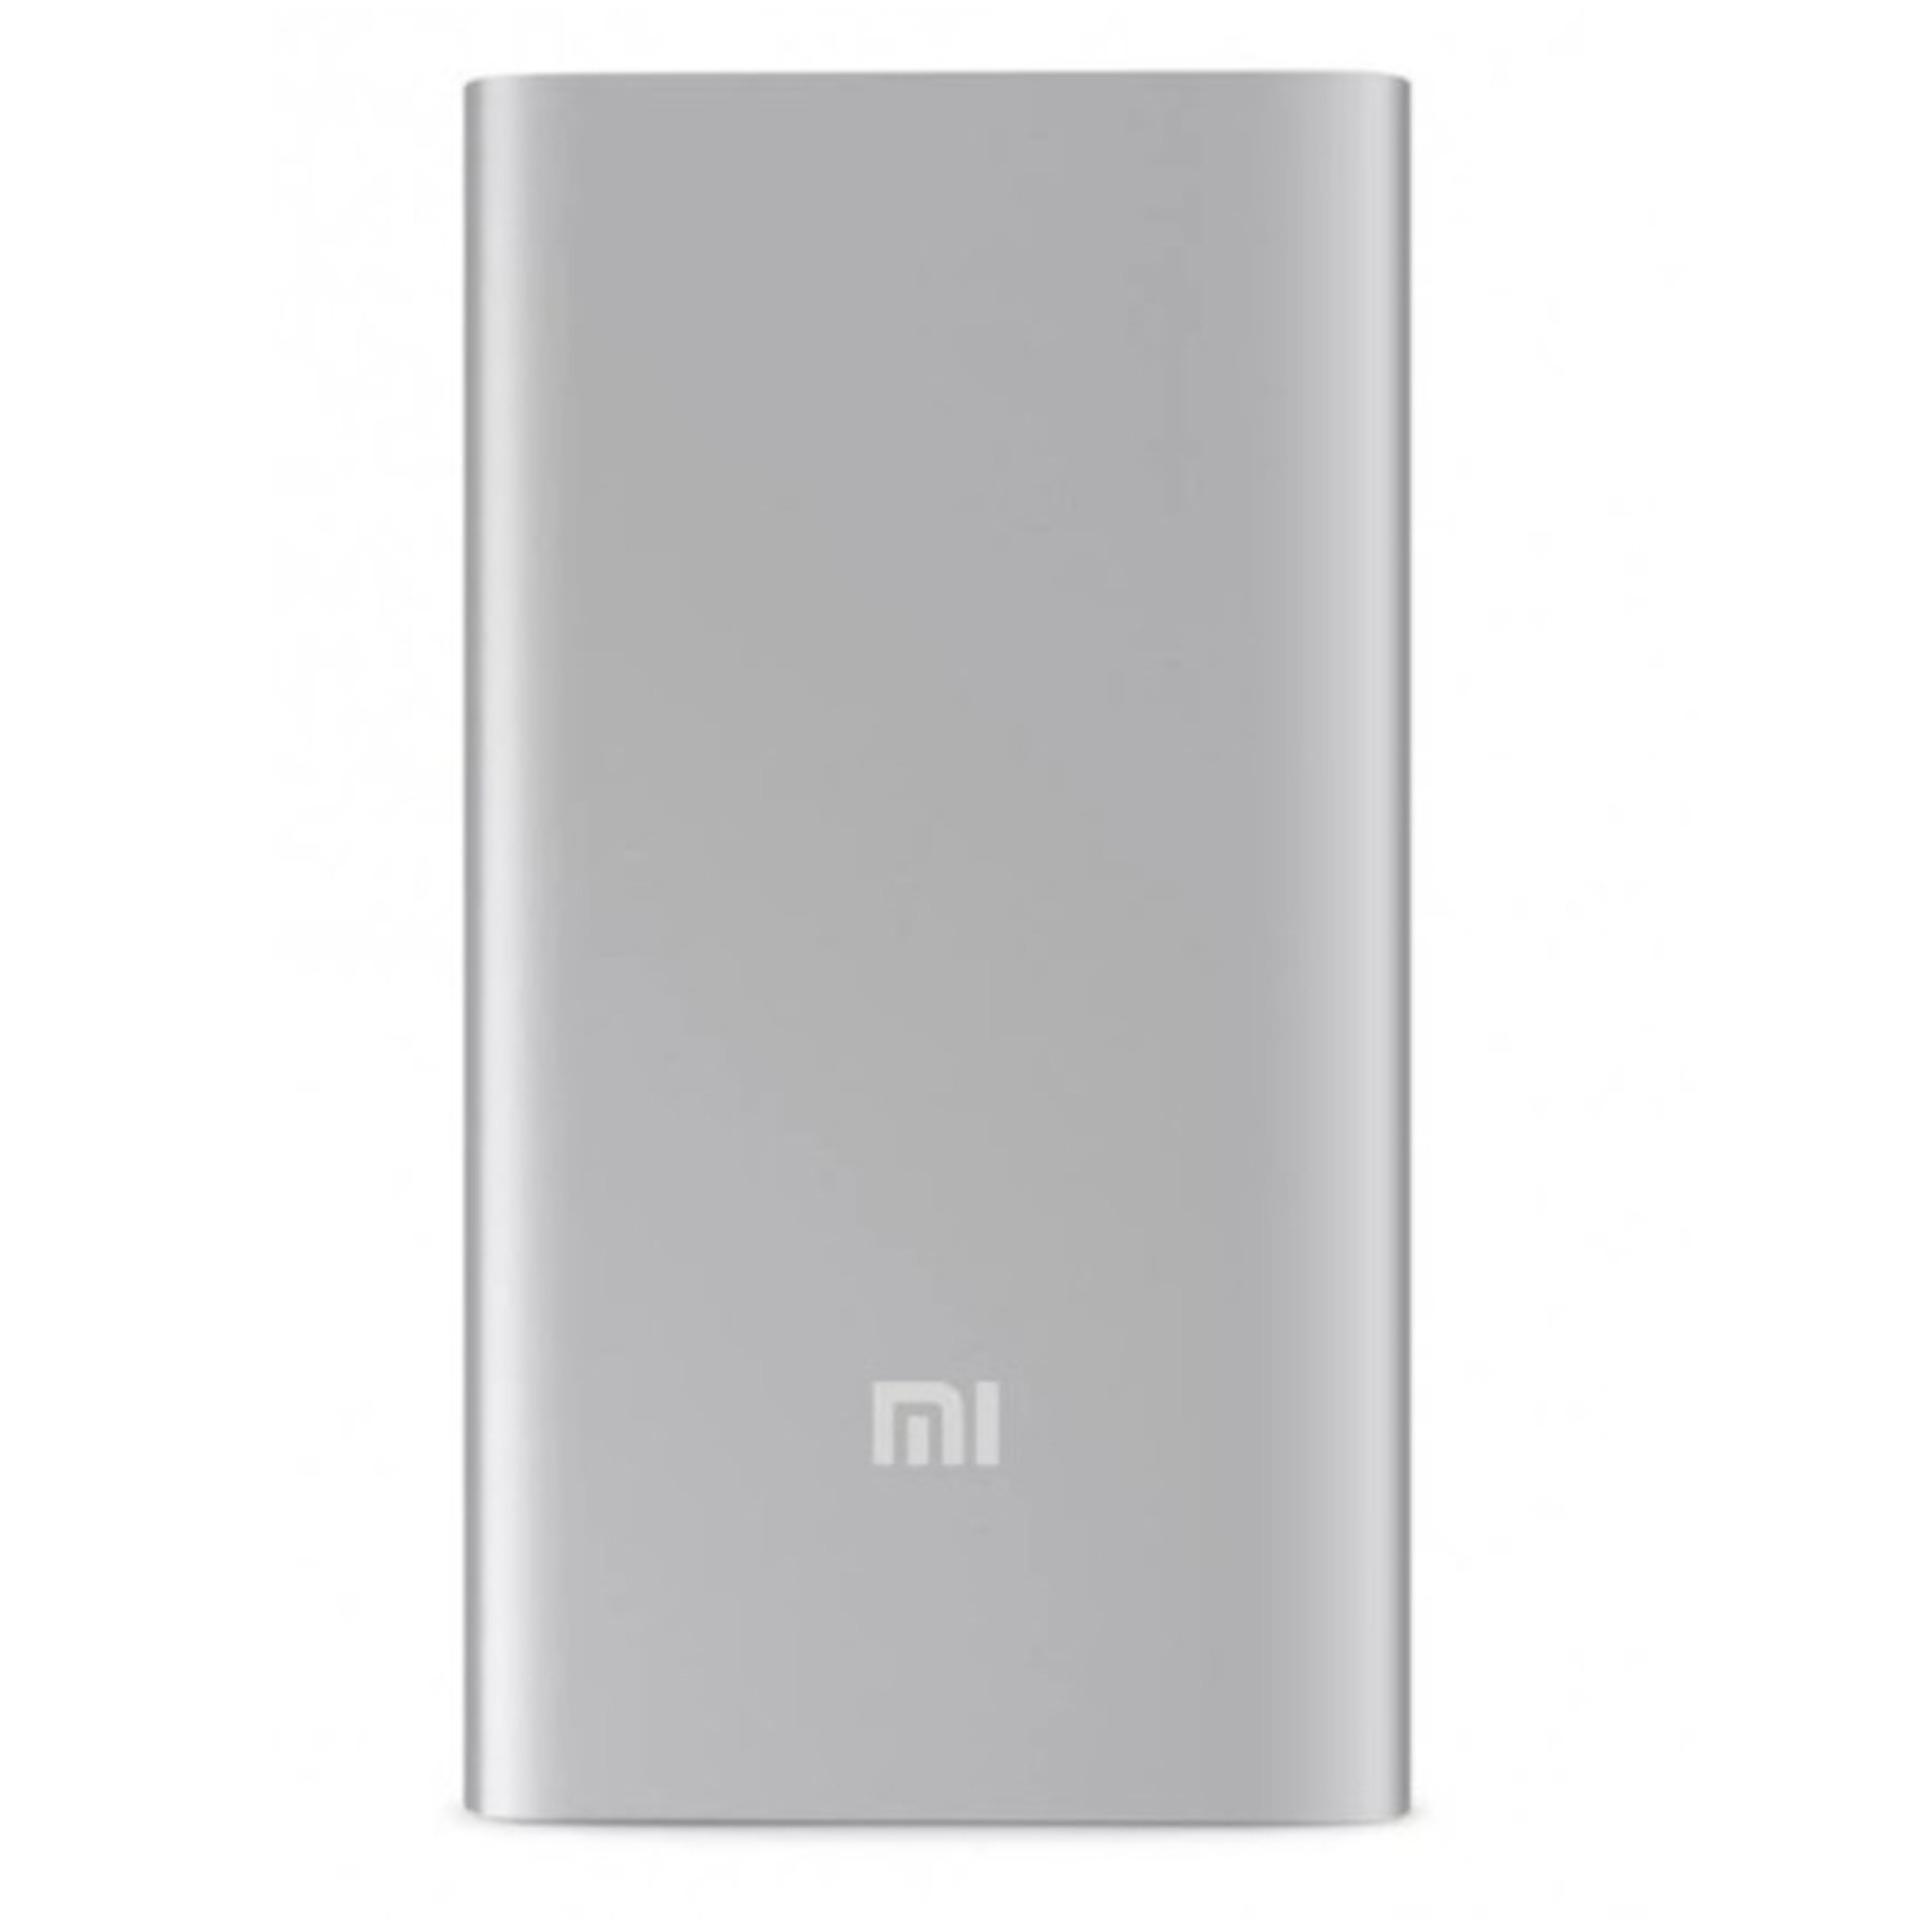 Xiaomi Phone Accessories Philippines Cellphone Original Kabel Data Tipe C Mi4c Mi5 Mimix Mi Pad 2 3 Redmi Pro 5000mah Ultra Thin Power Bank Silver